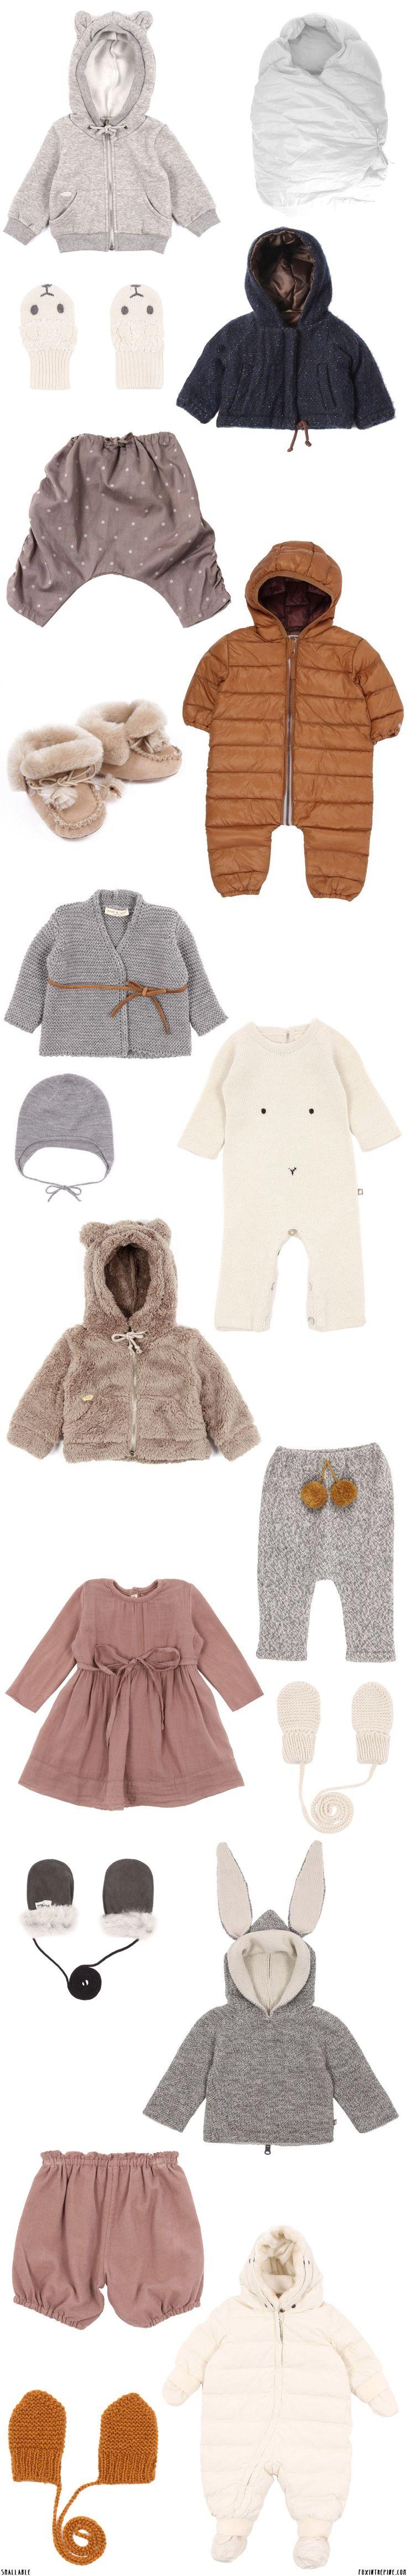 For my future Alaskan Eskimo baby  Smallable on foxinthepine.com